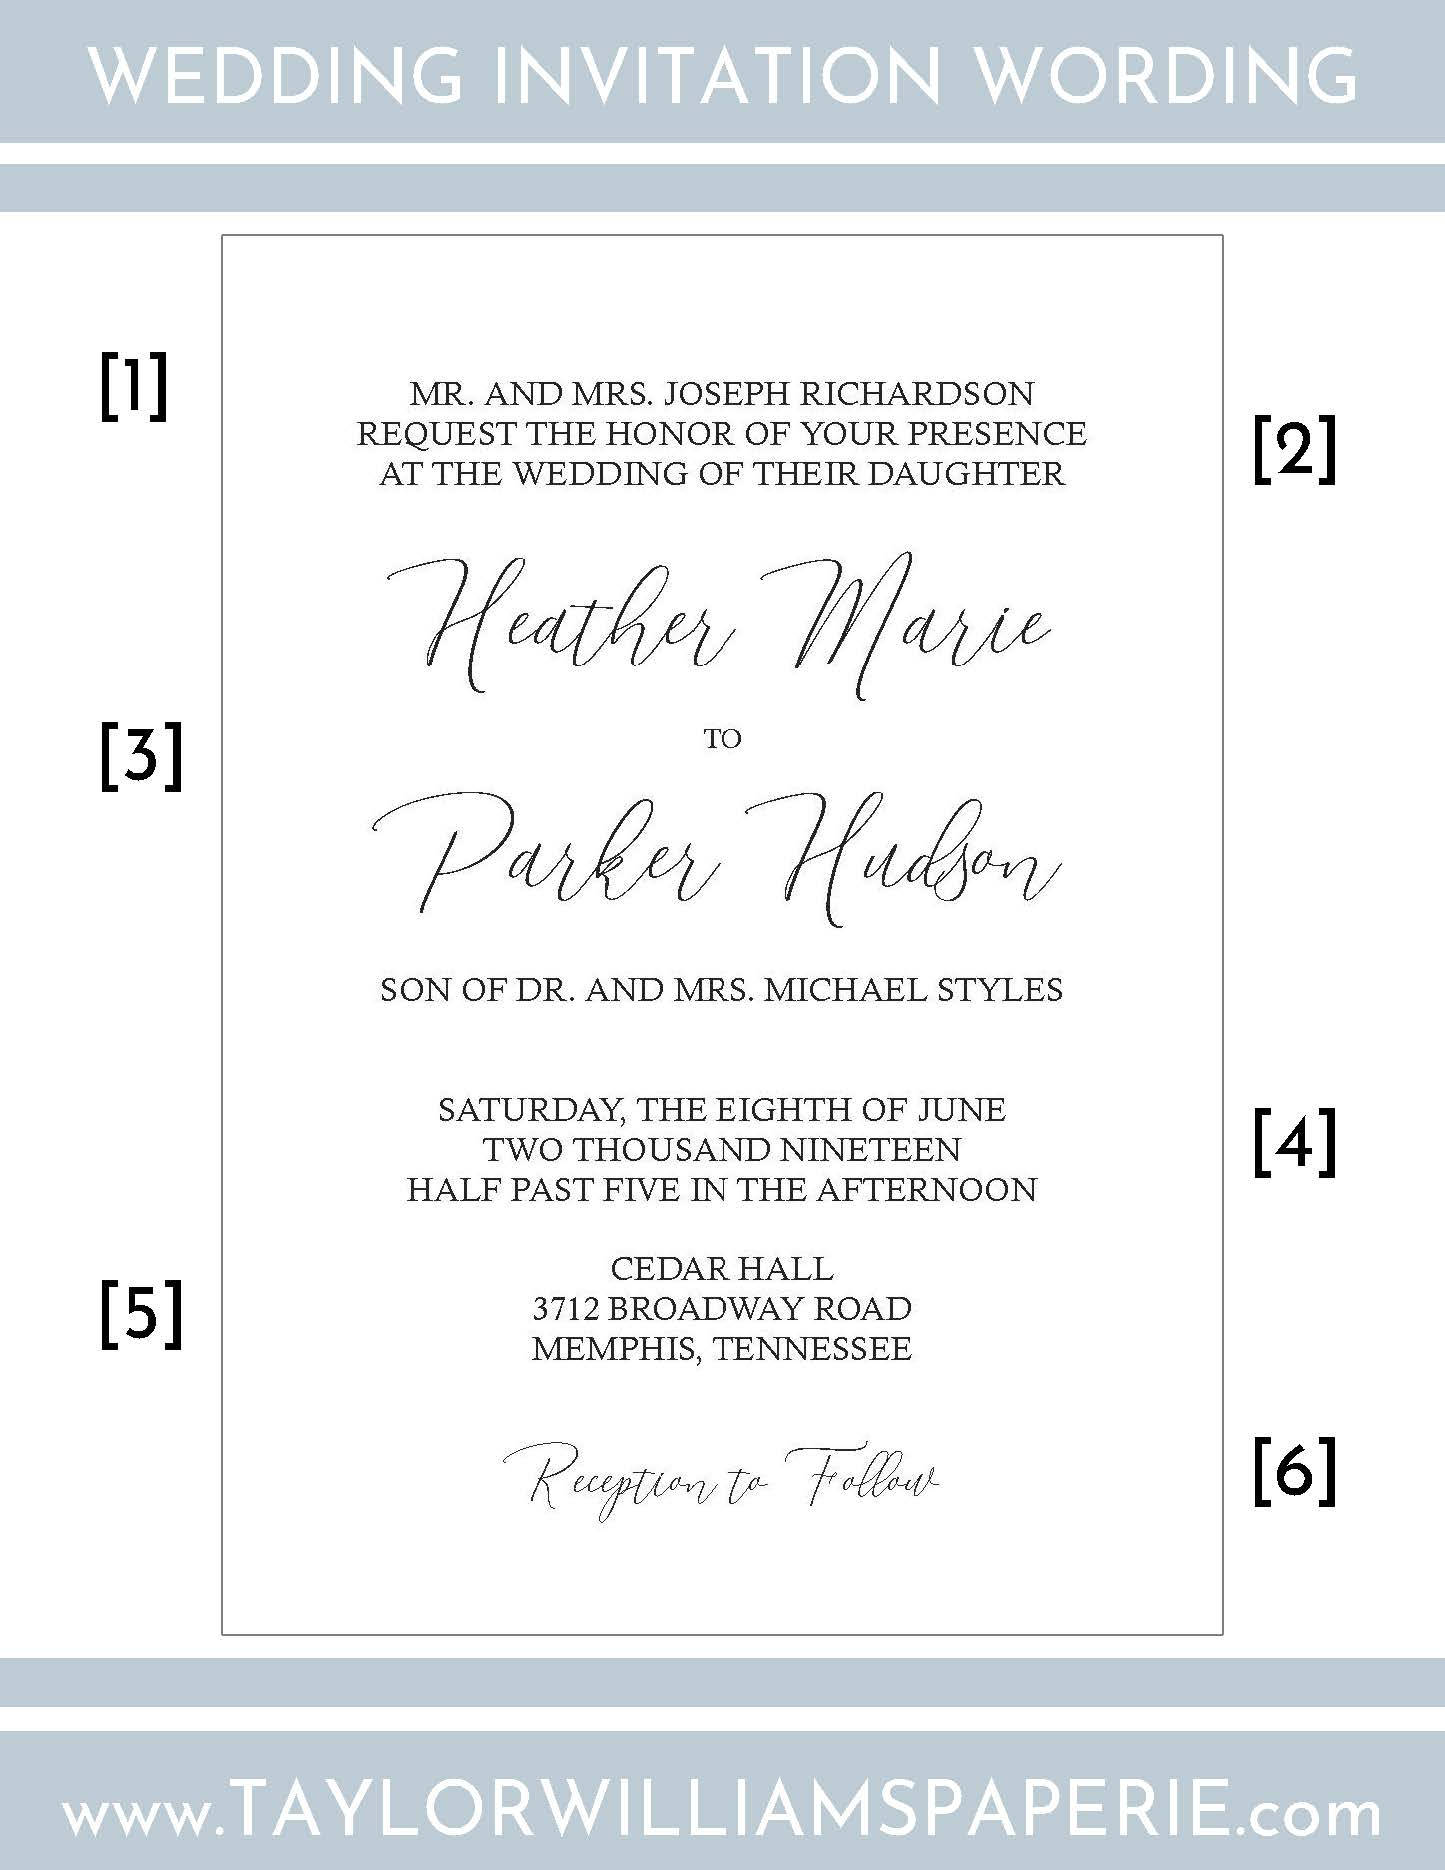 wedding invitation wording breakdown.jpg